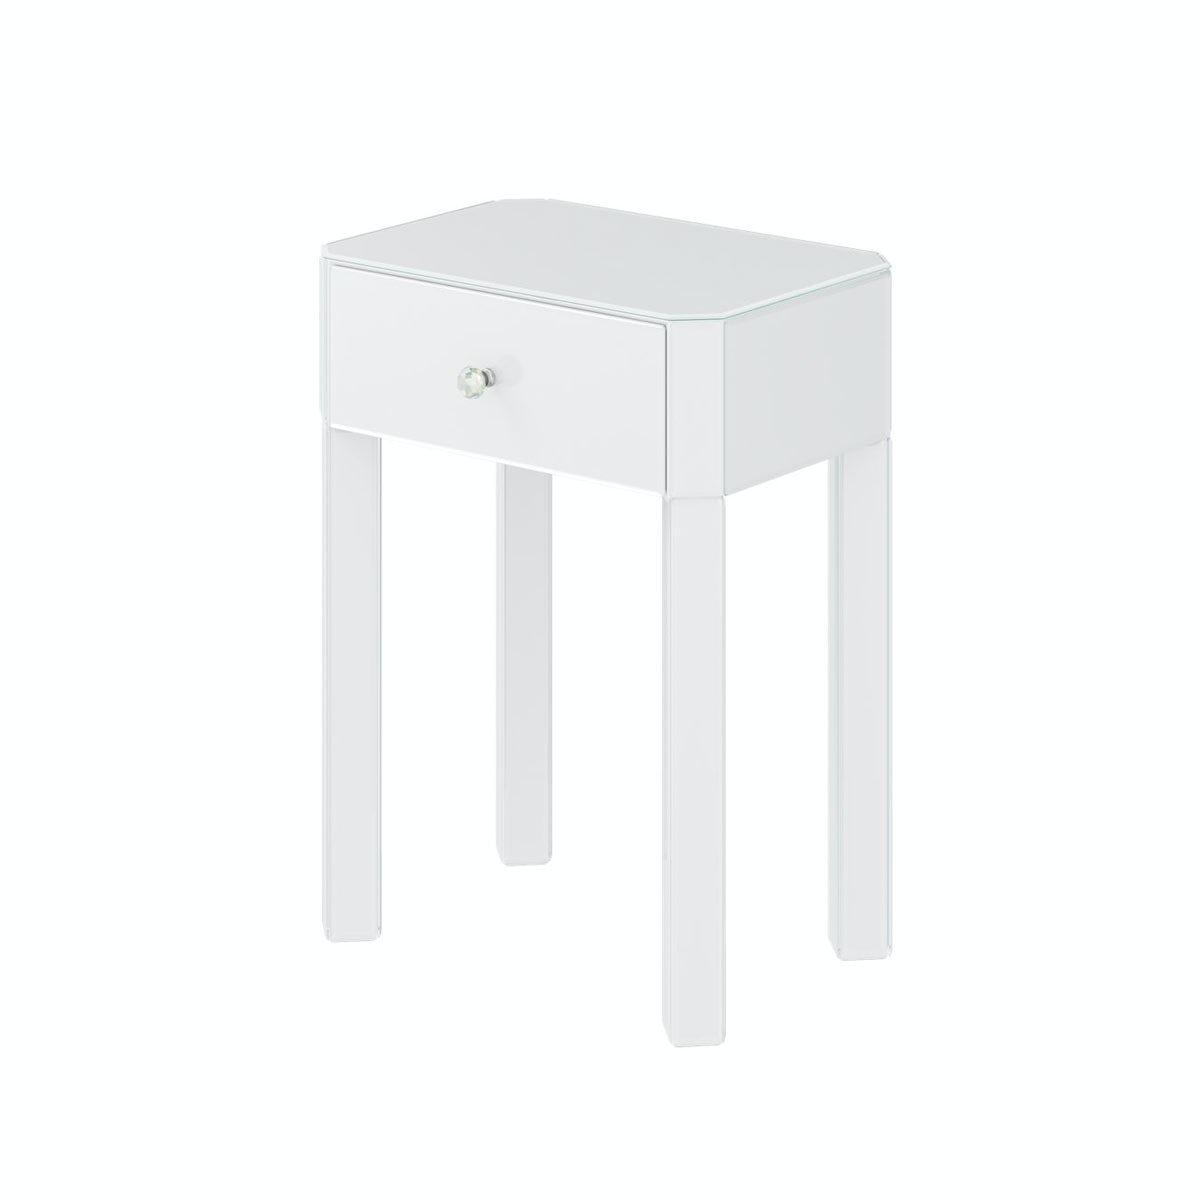 Paris White Glass 1 drawer bedside